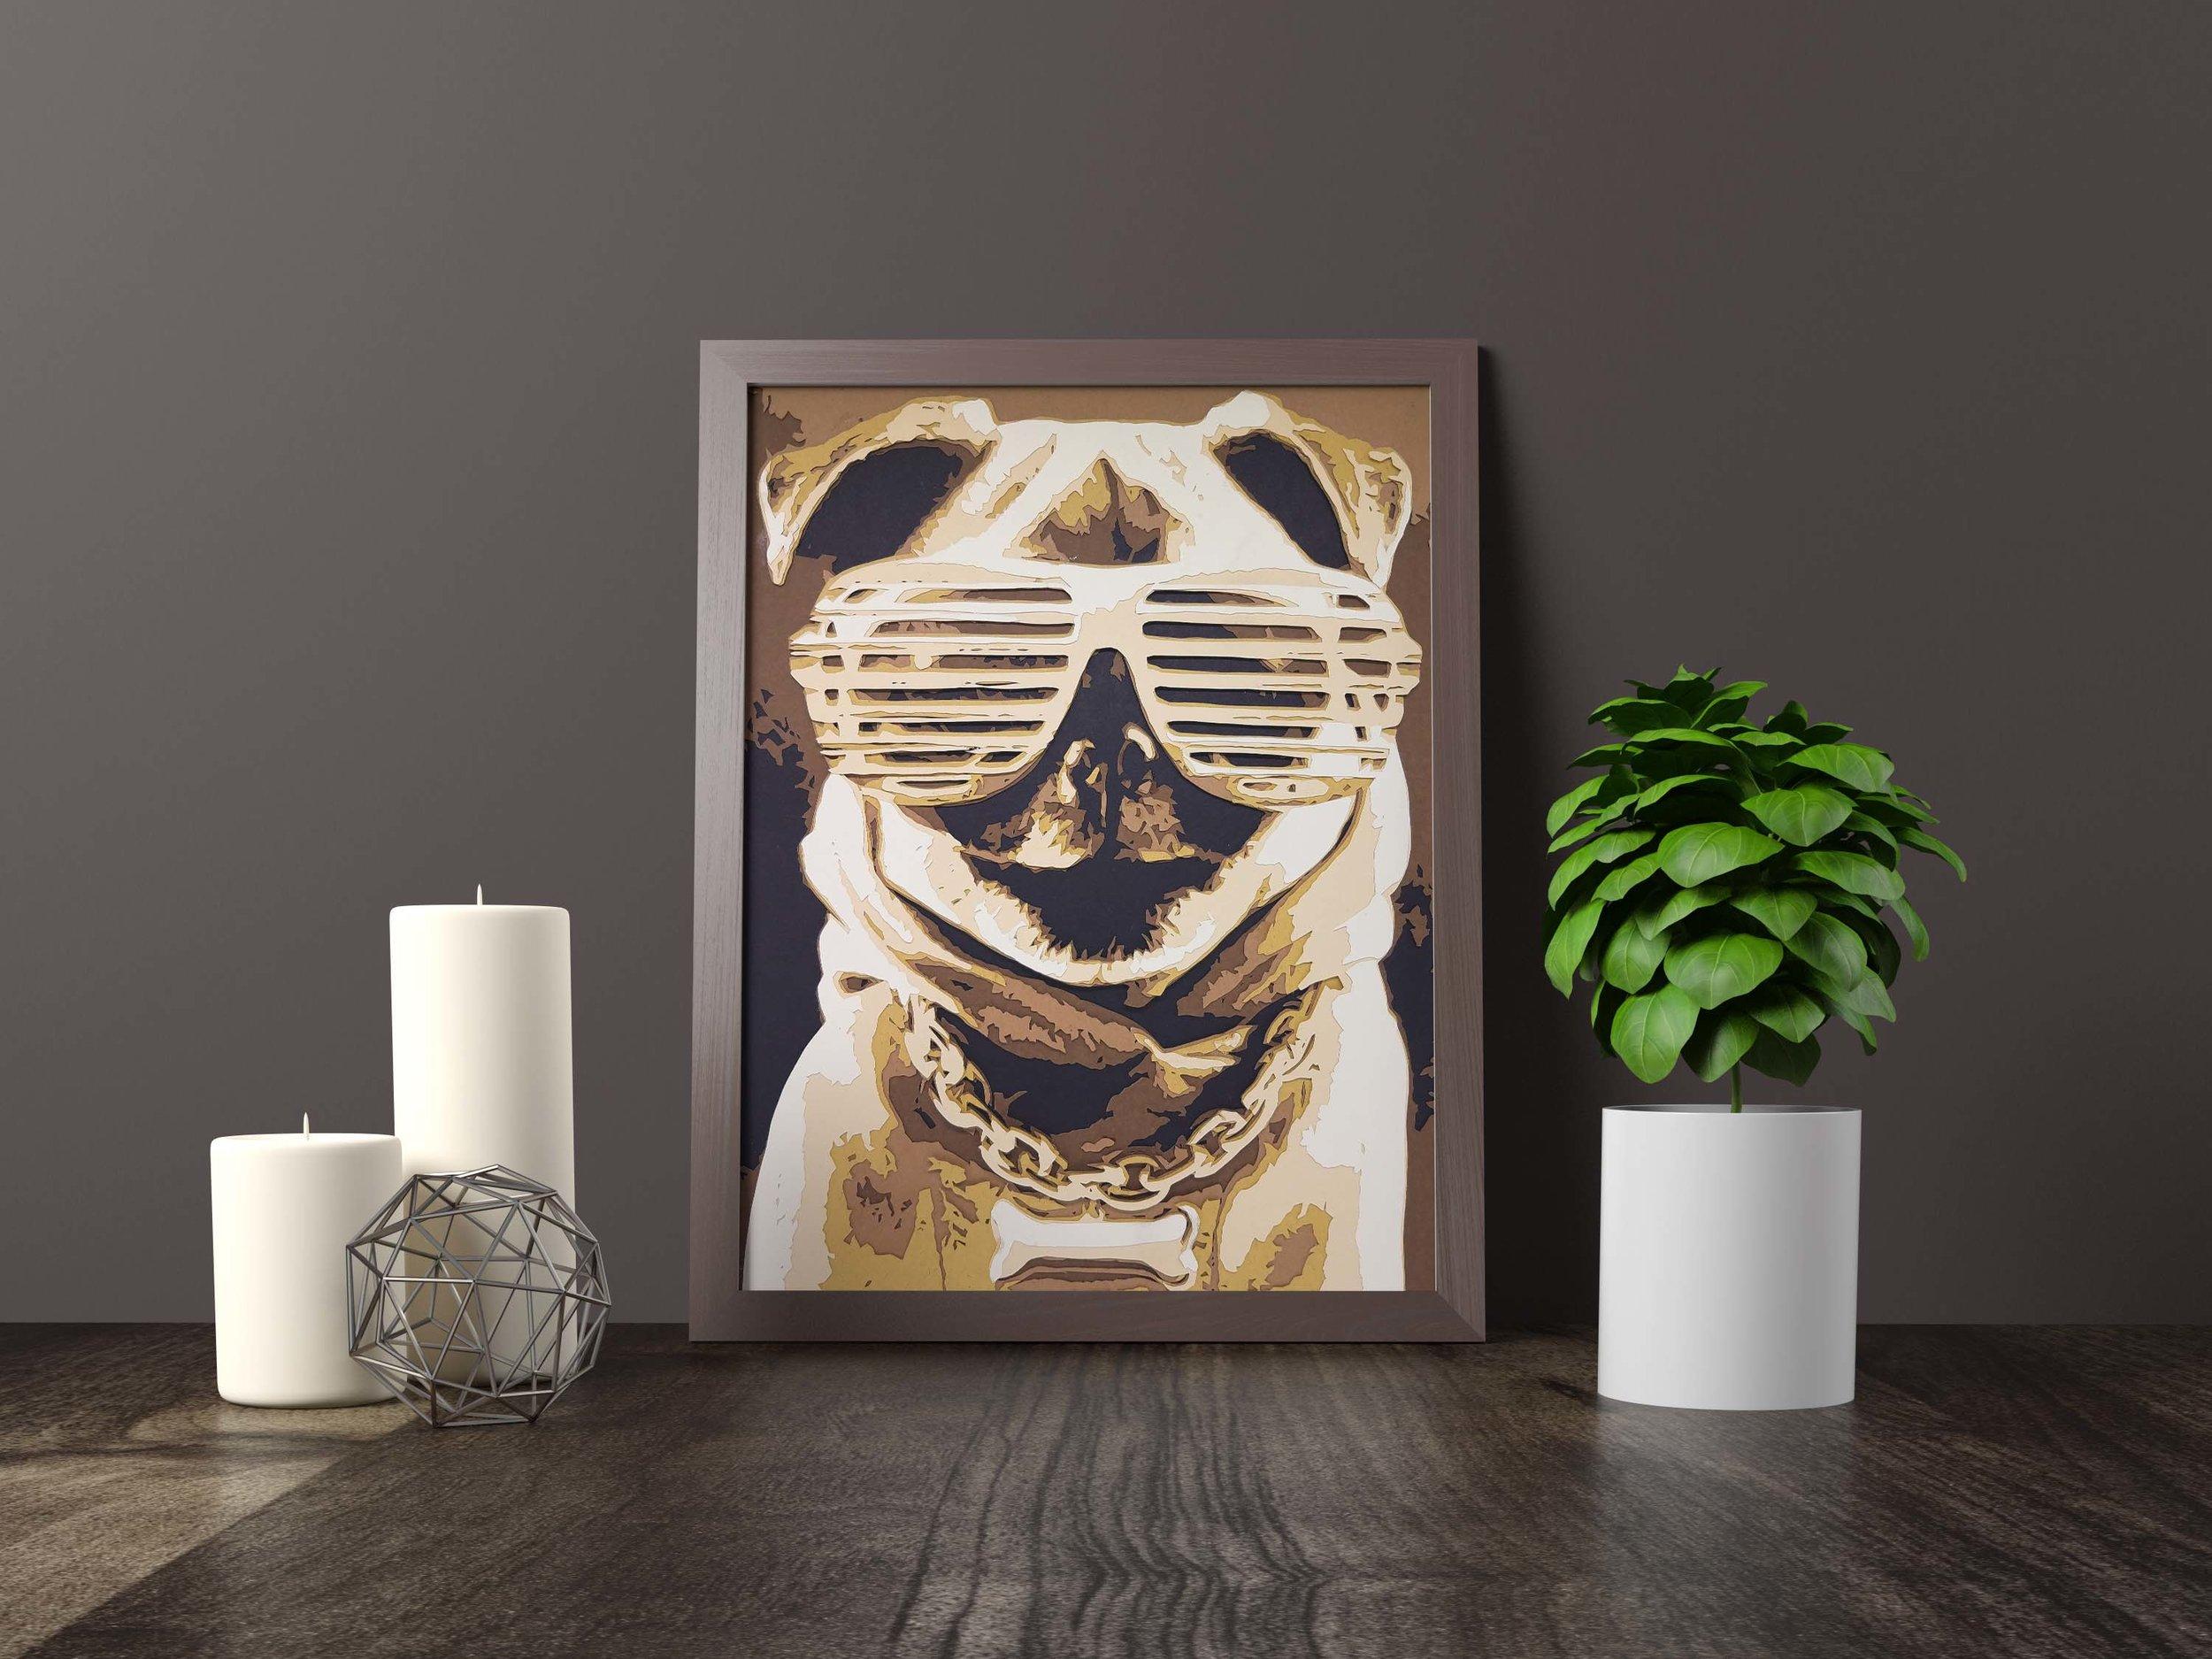 pug life thug life - Original Artwork *SOLD* 11